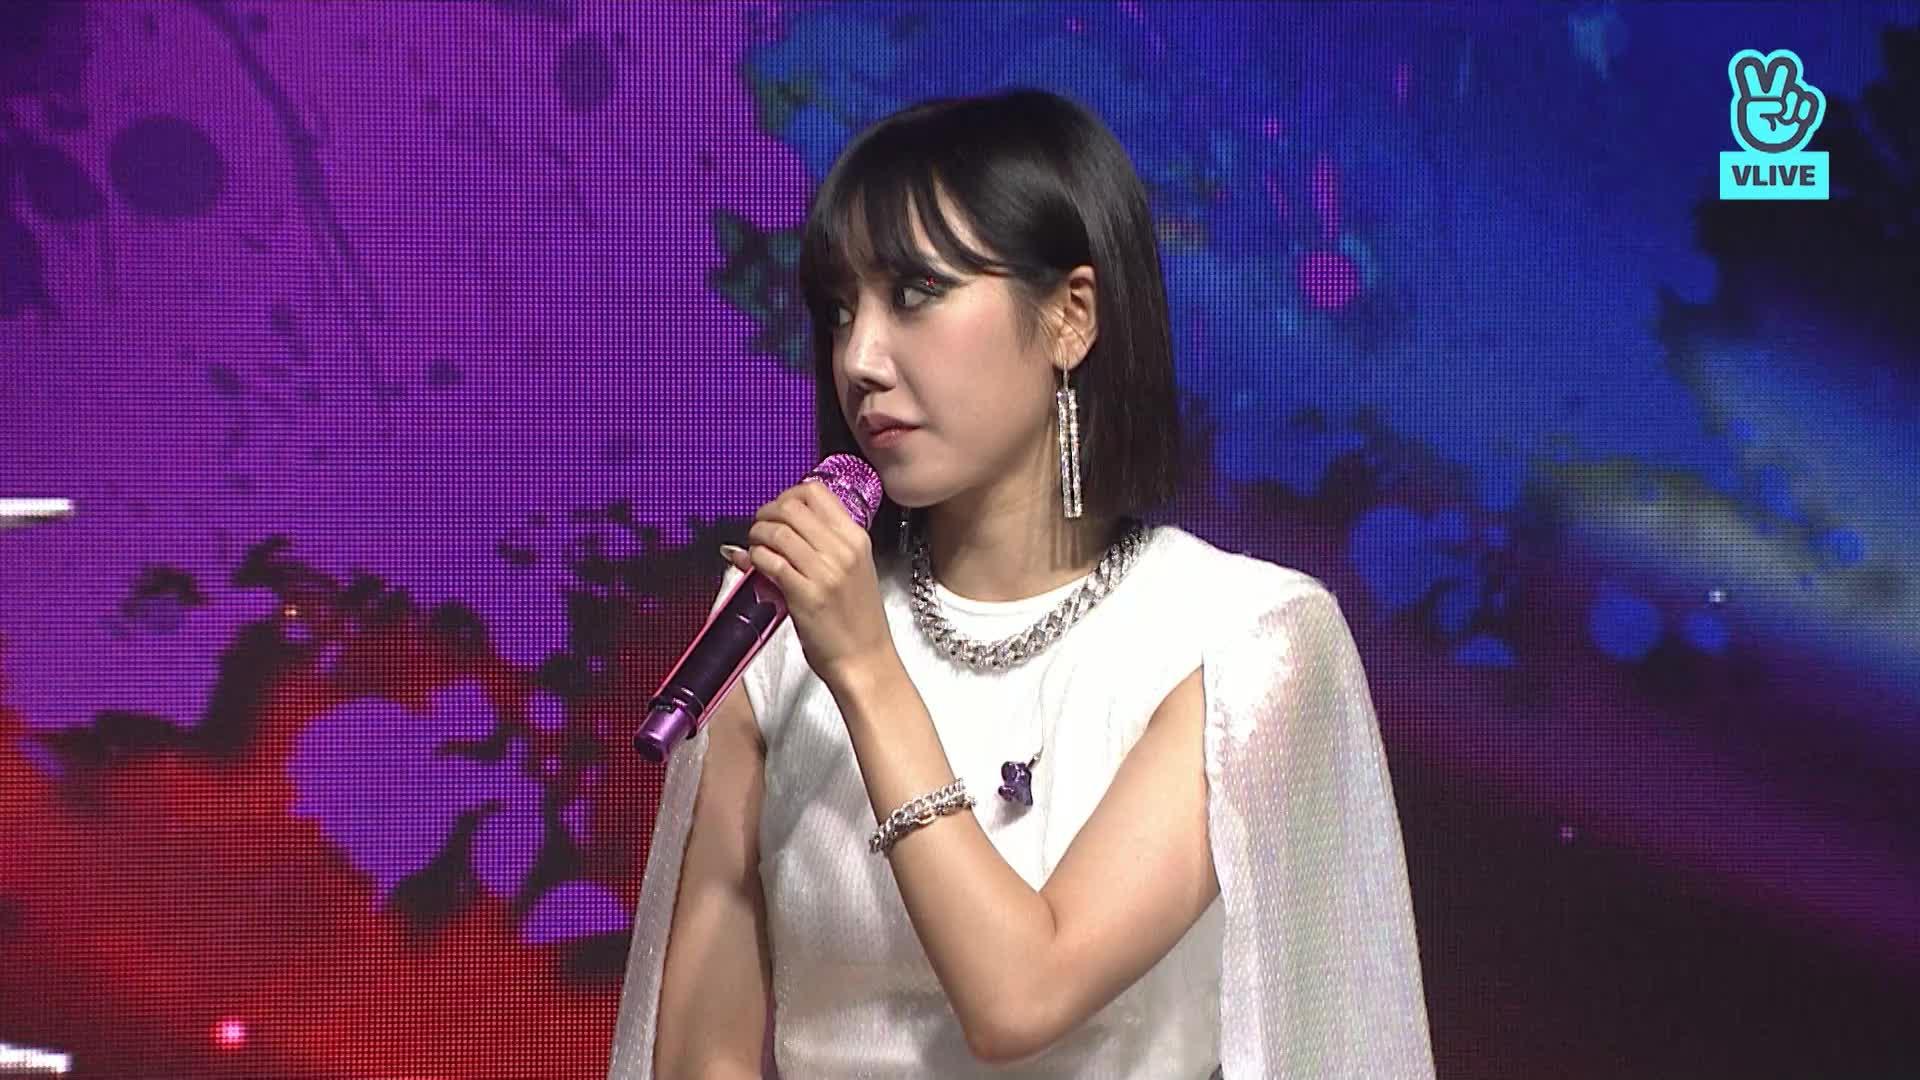 [Replay] 김남주 1ST SINGLE ALBUM 'Bird' FAN SHOWCASE